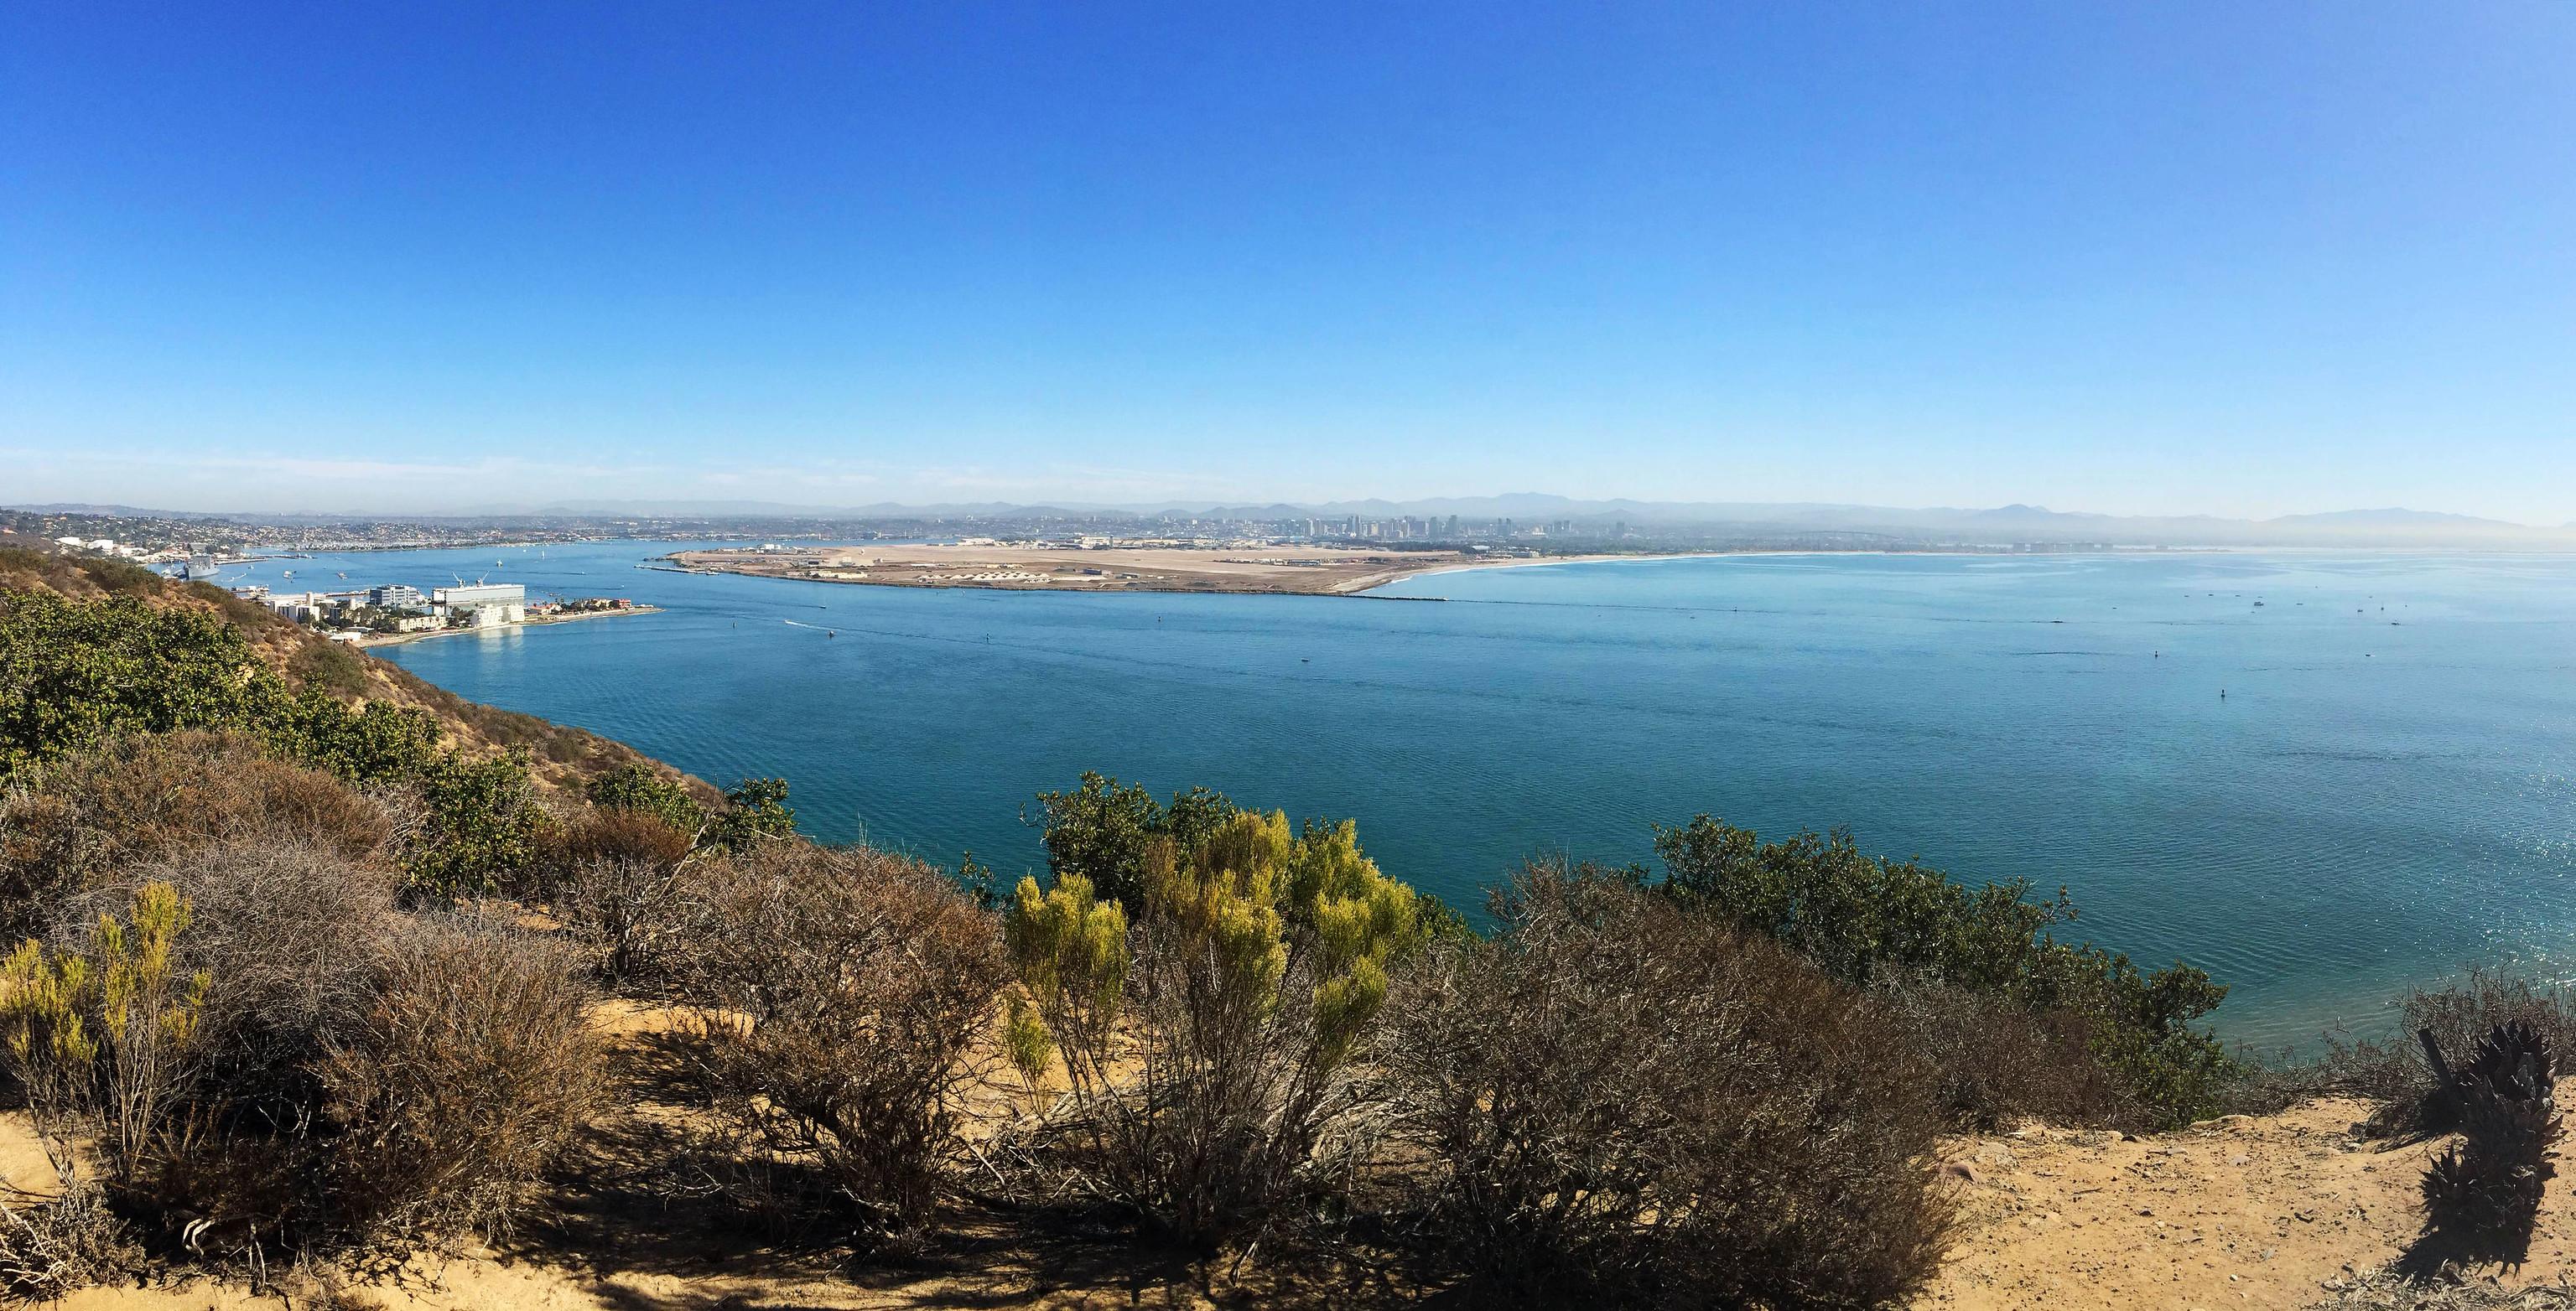 Point Loma Lighthouse, California, USA